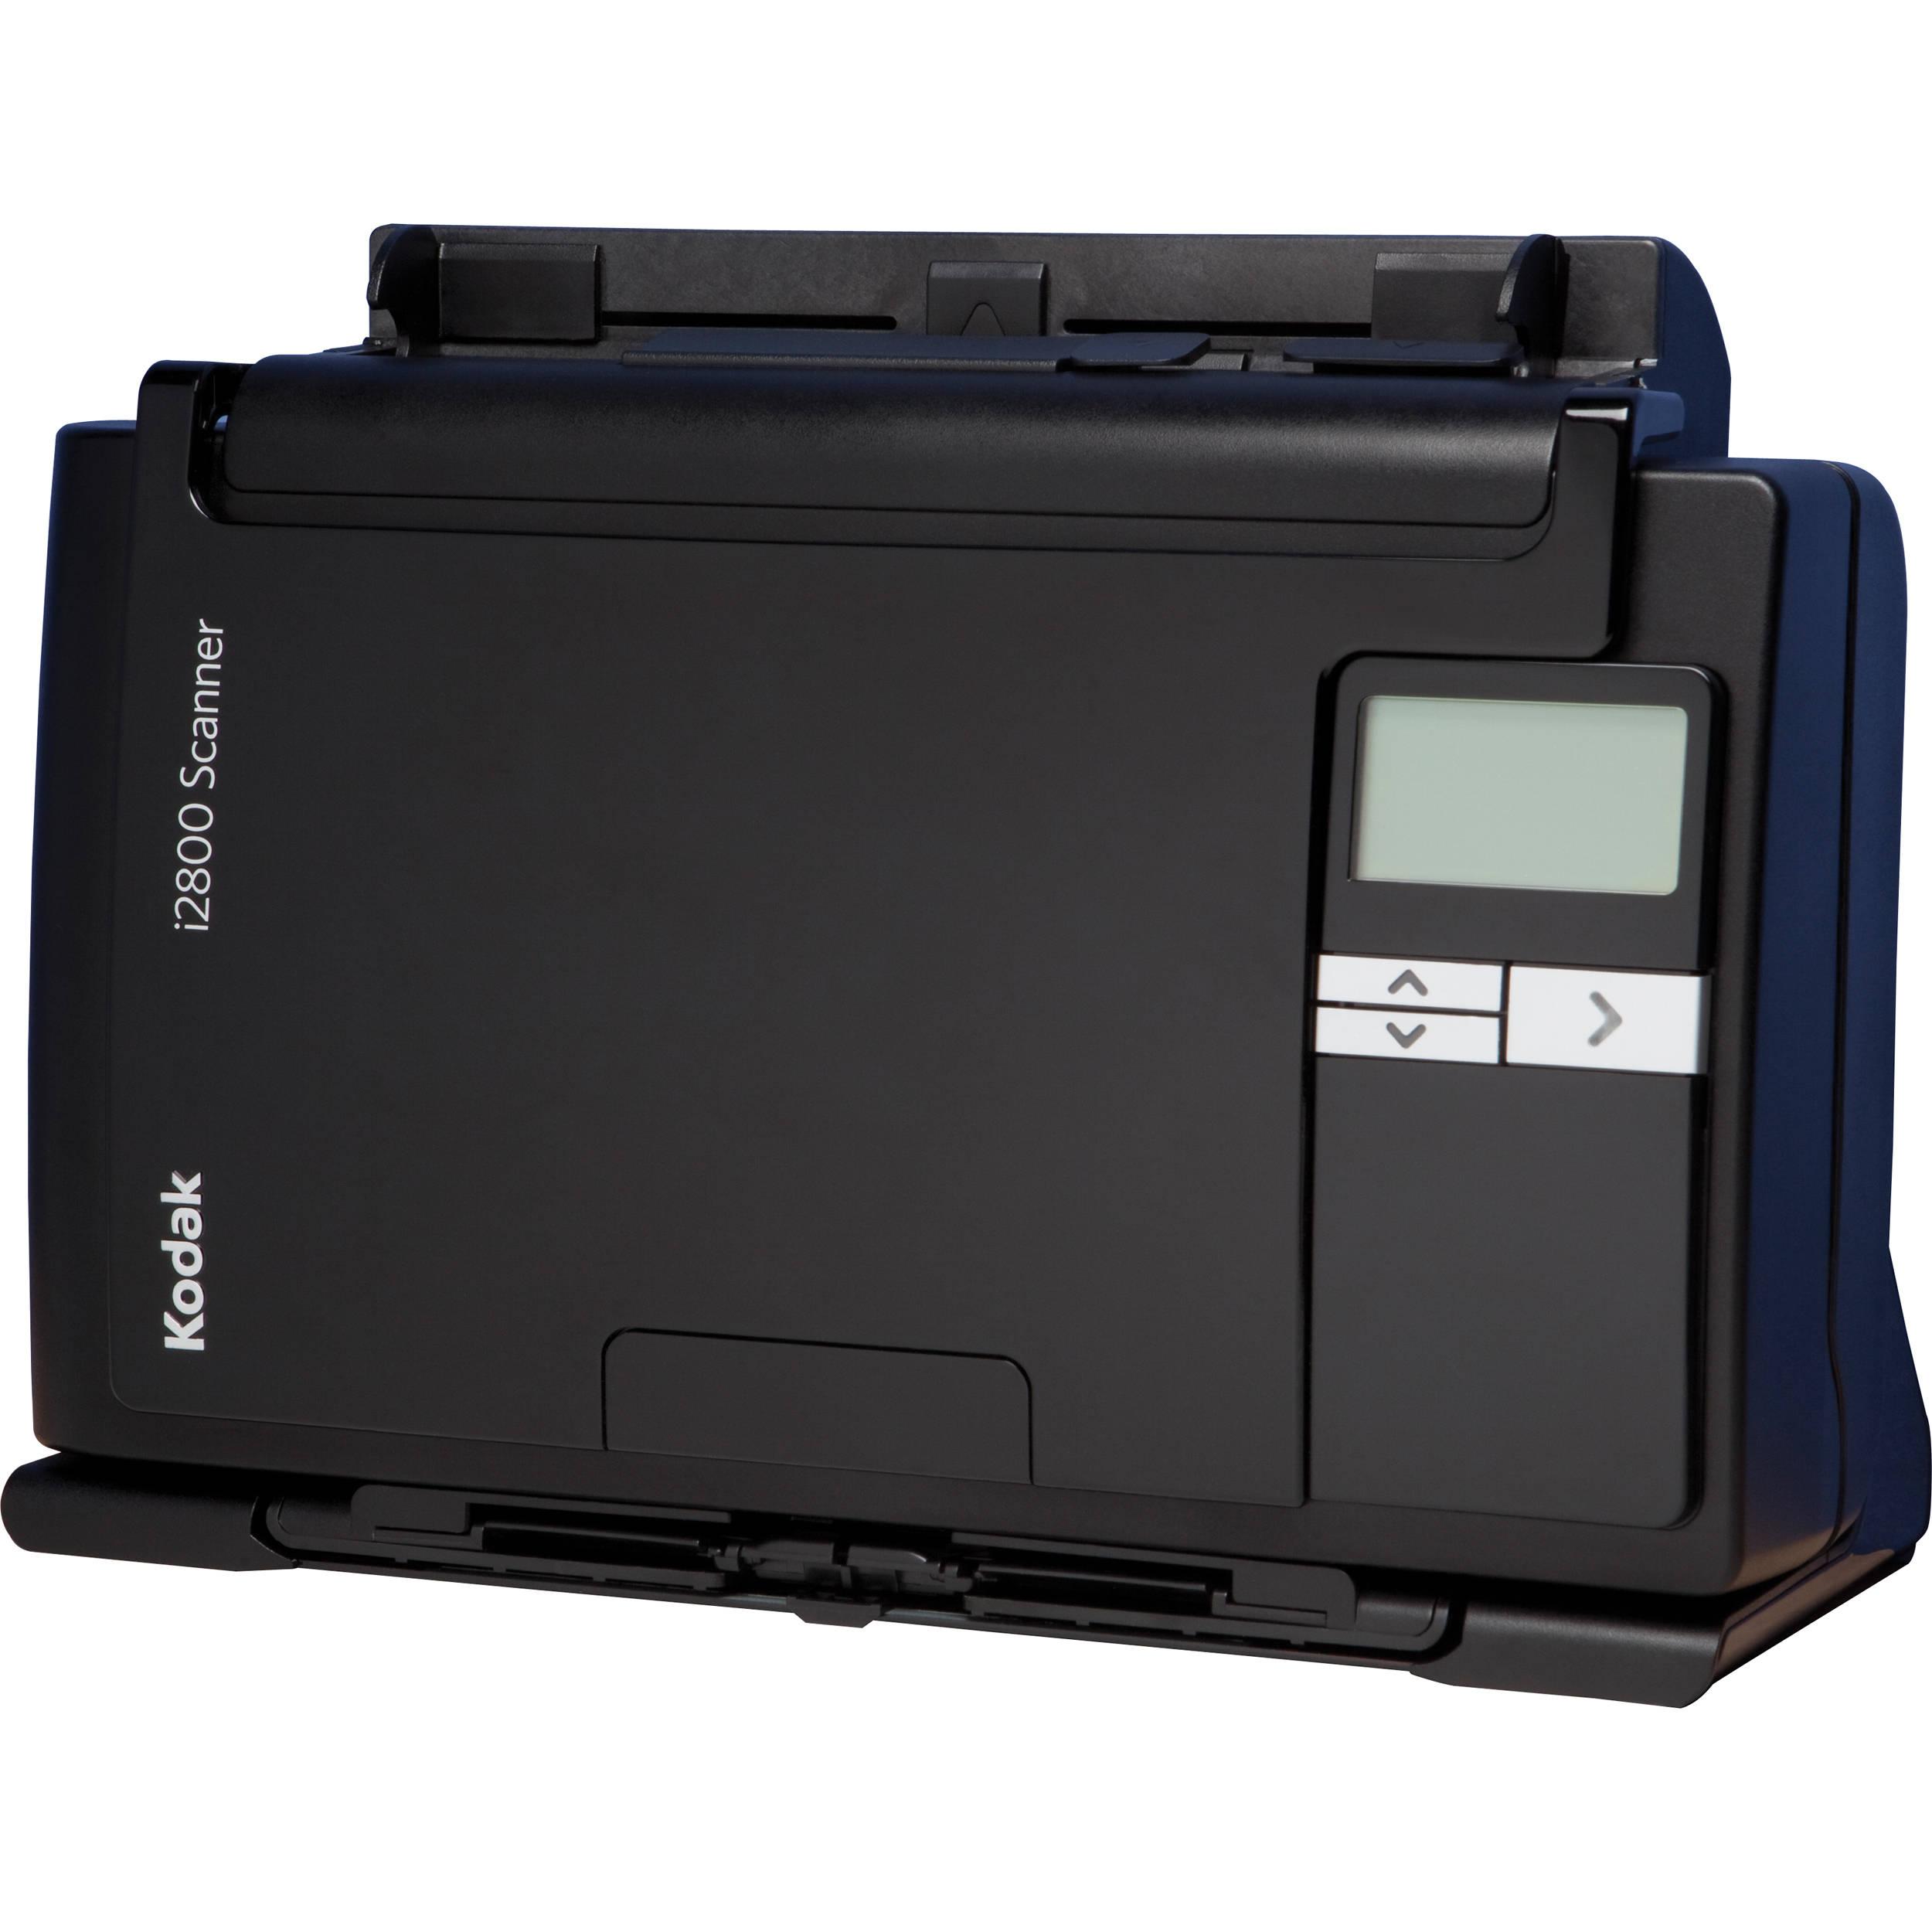 kodak i2600 document scanner 1333707 bh photo video With kodak document scanner